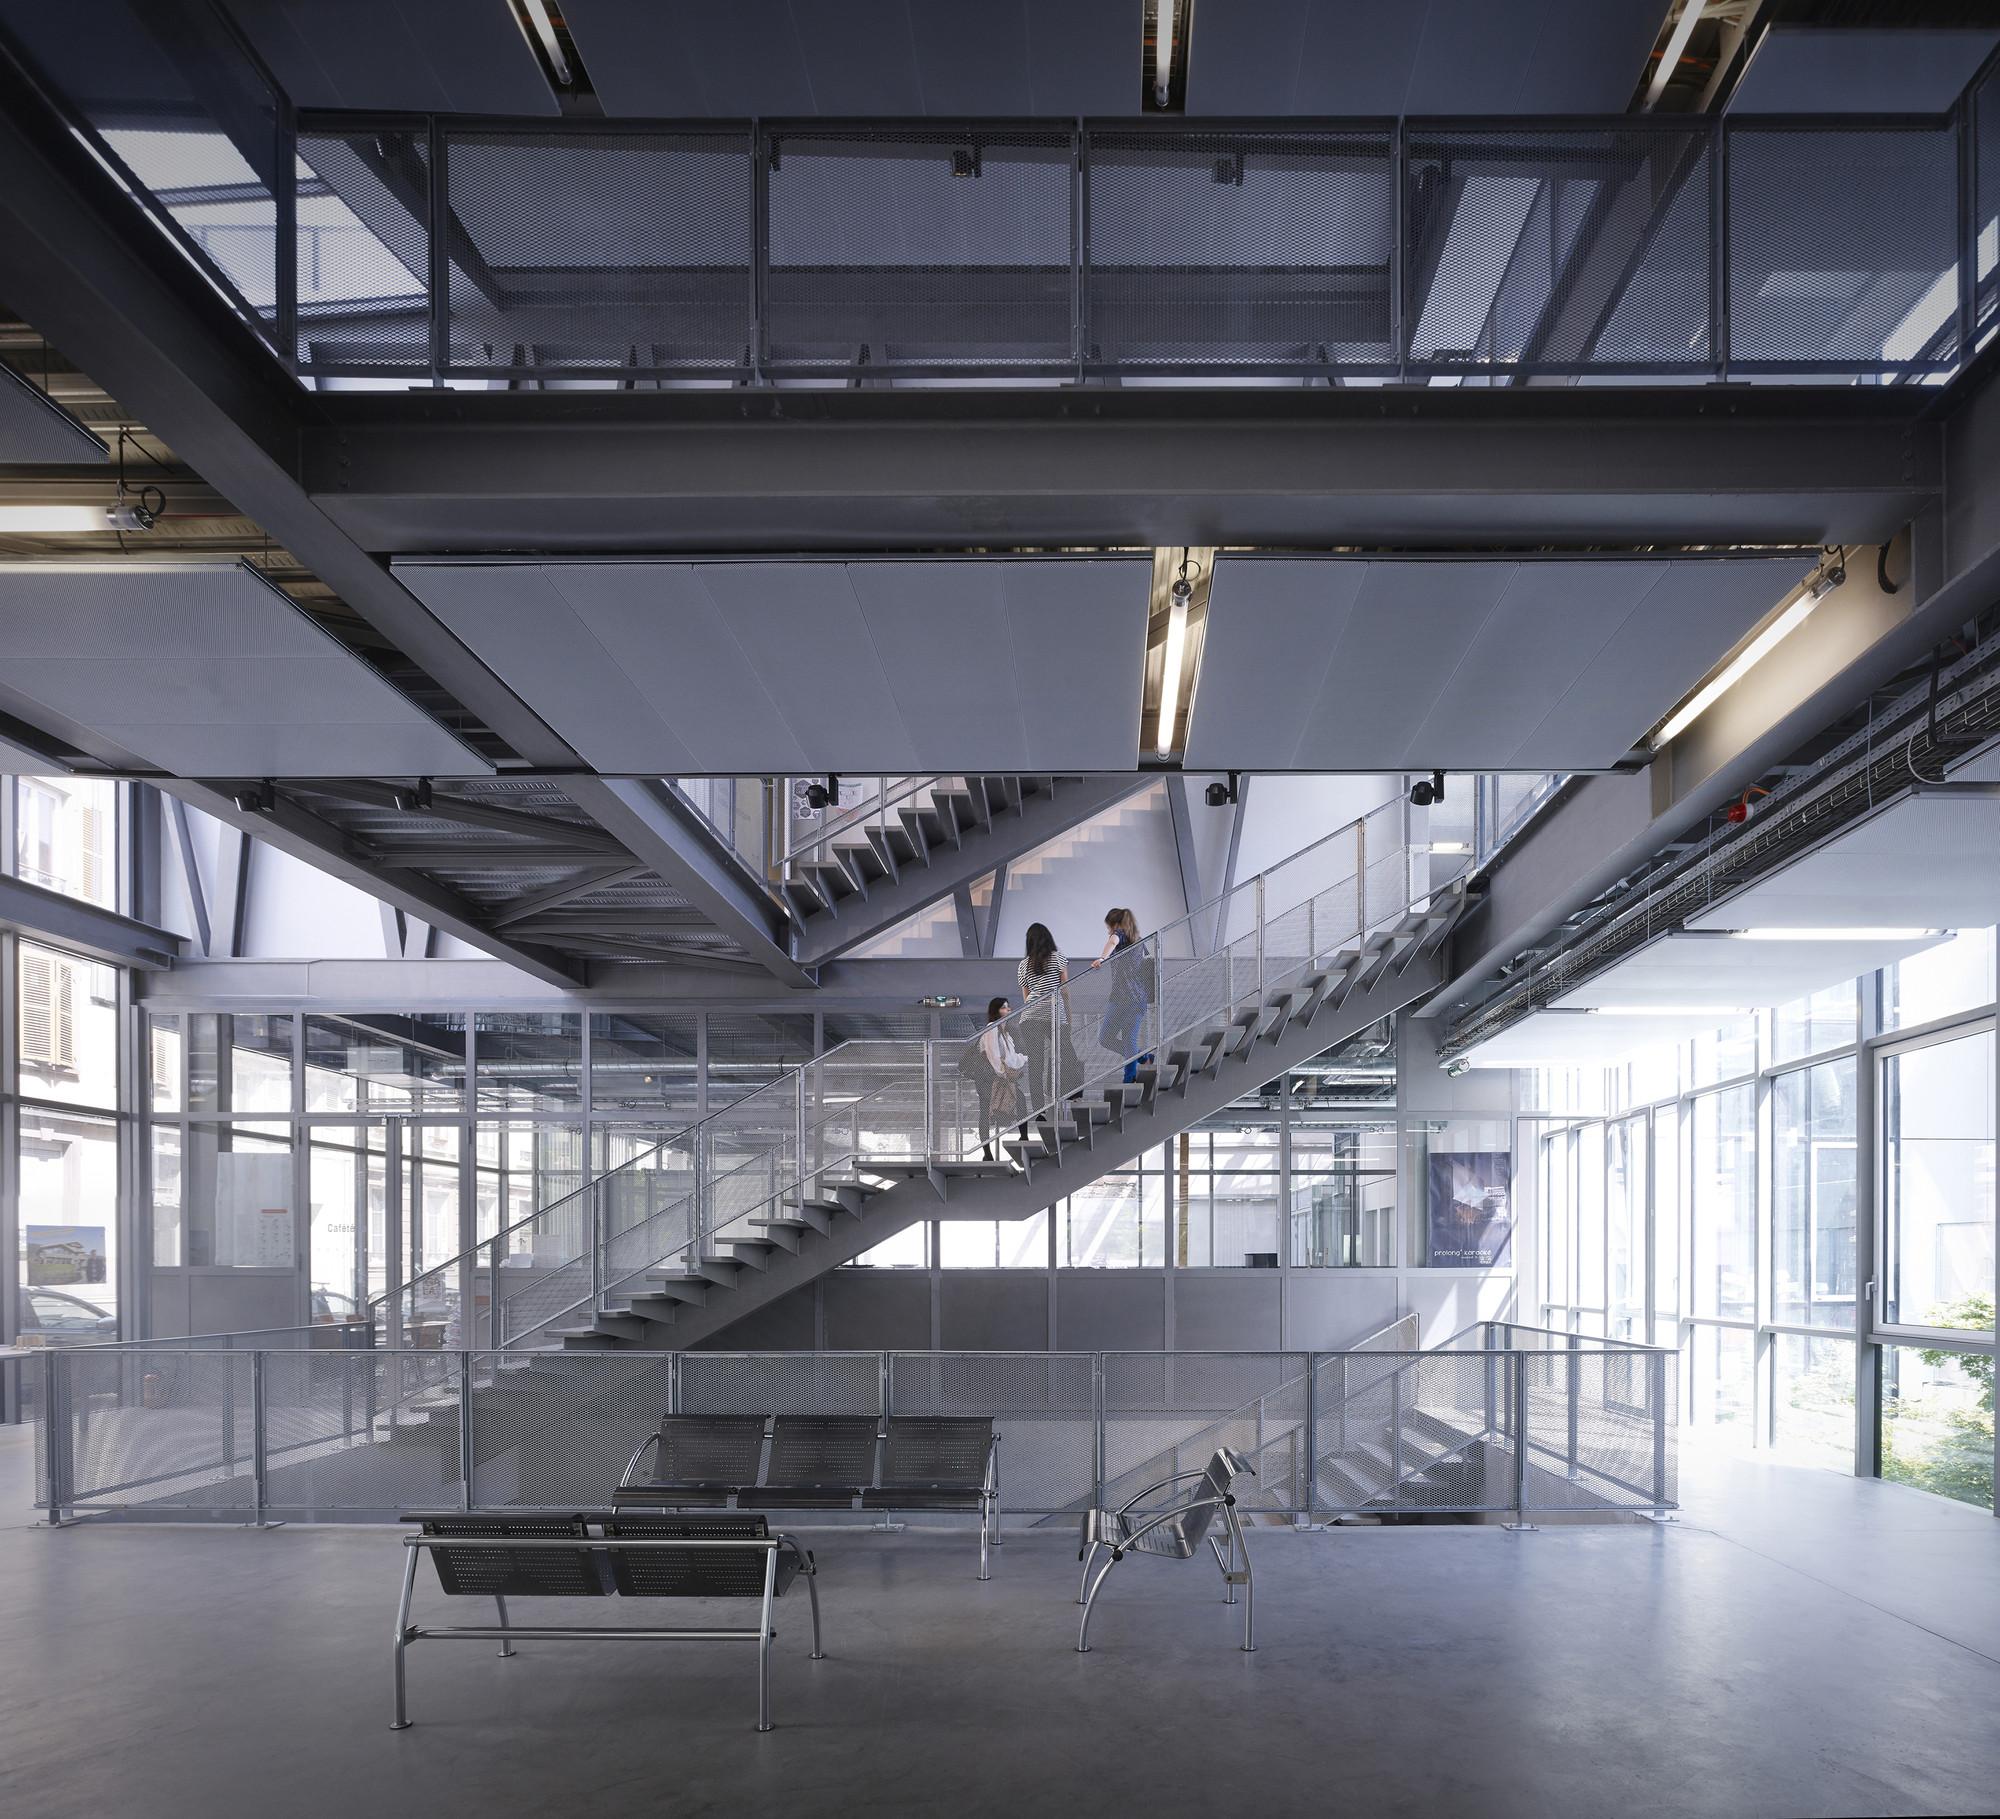 Galeria de escola de arquitetura de strasbourg marc for Strasbourg architecture